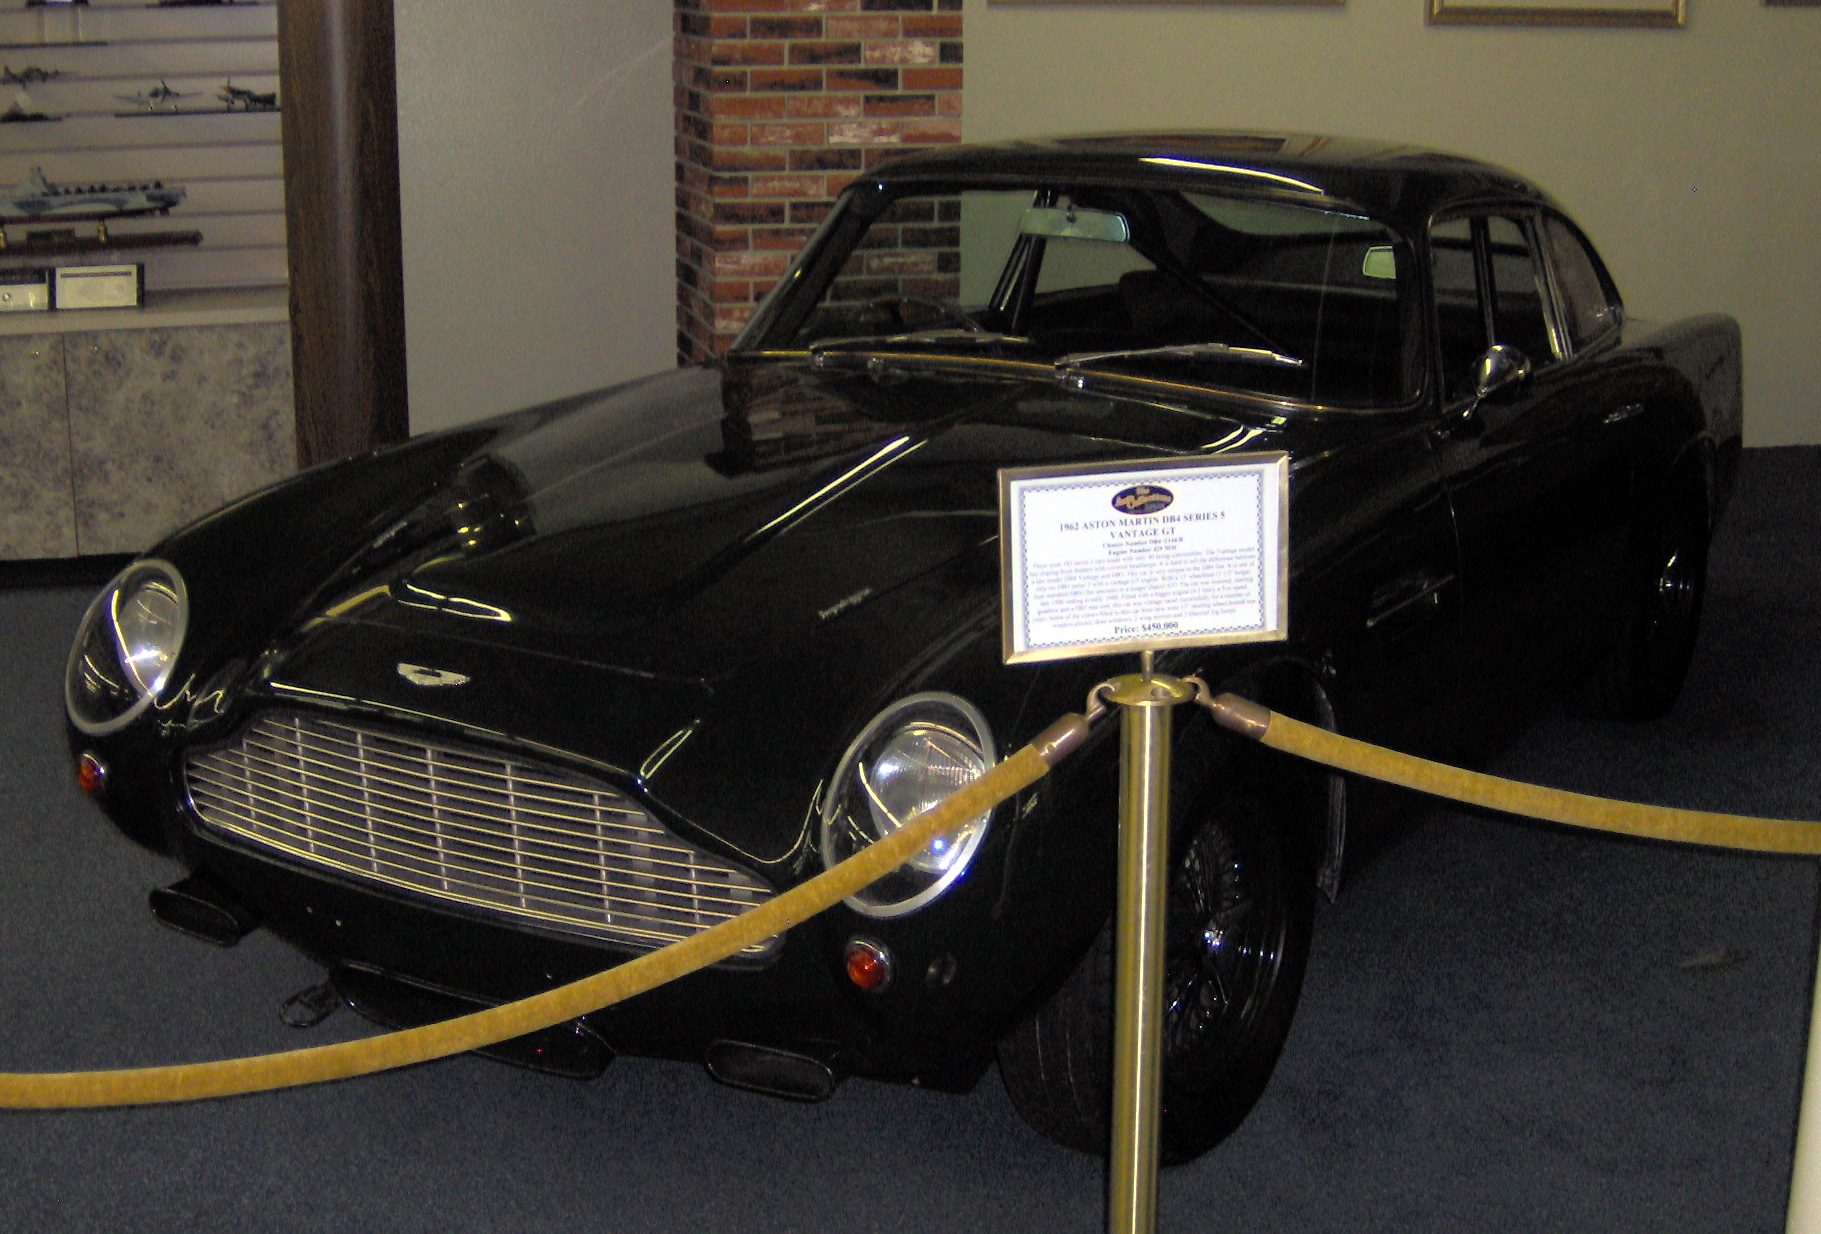 File:1962 Aston Martin DB4 Series 5 Vantage GT.JPG - Wikipedia, the ...